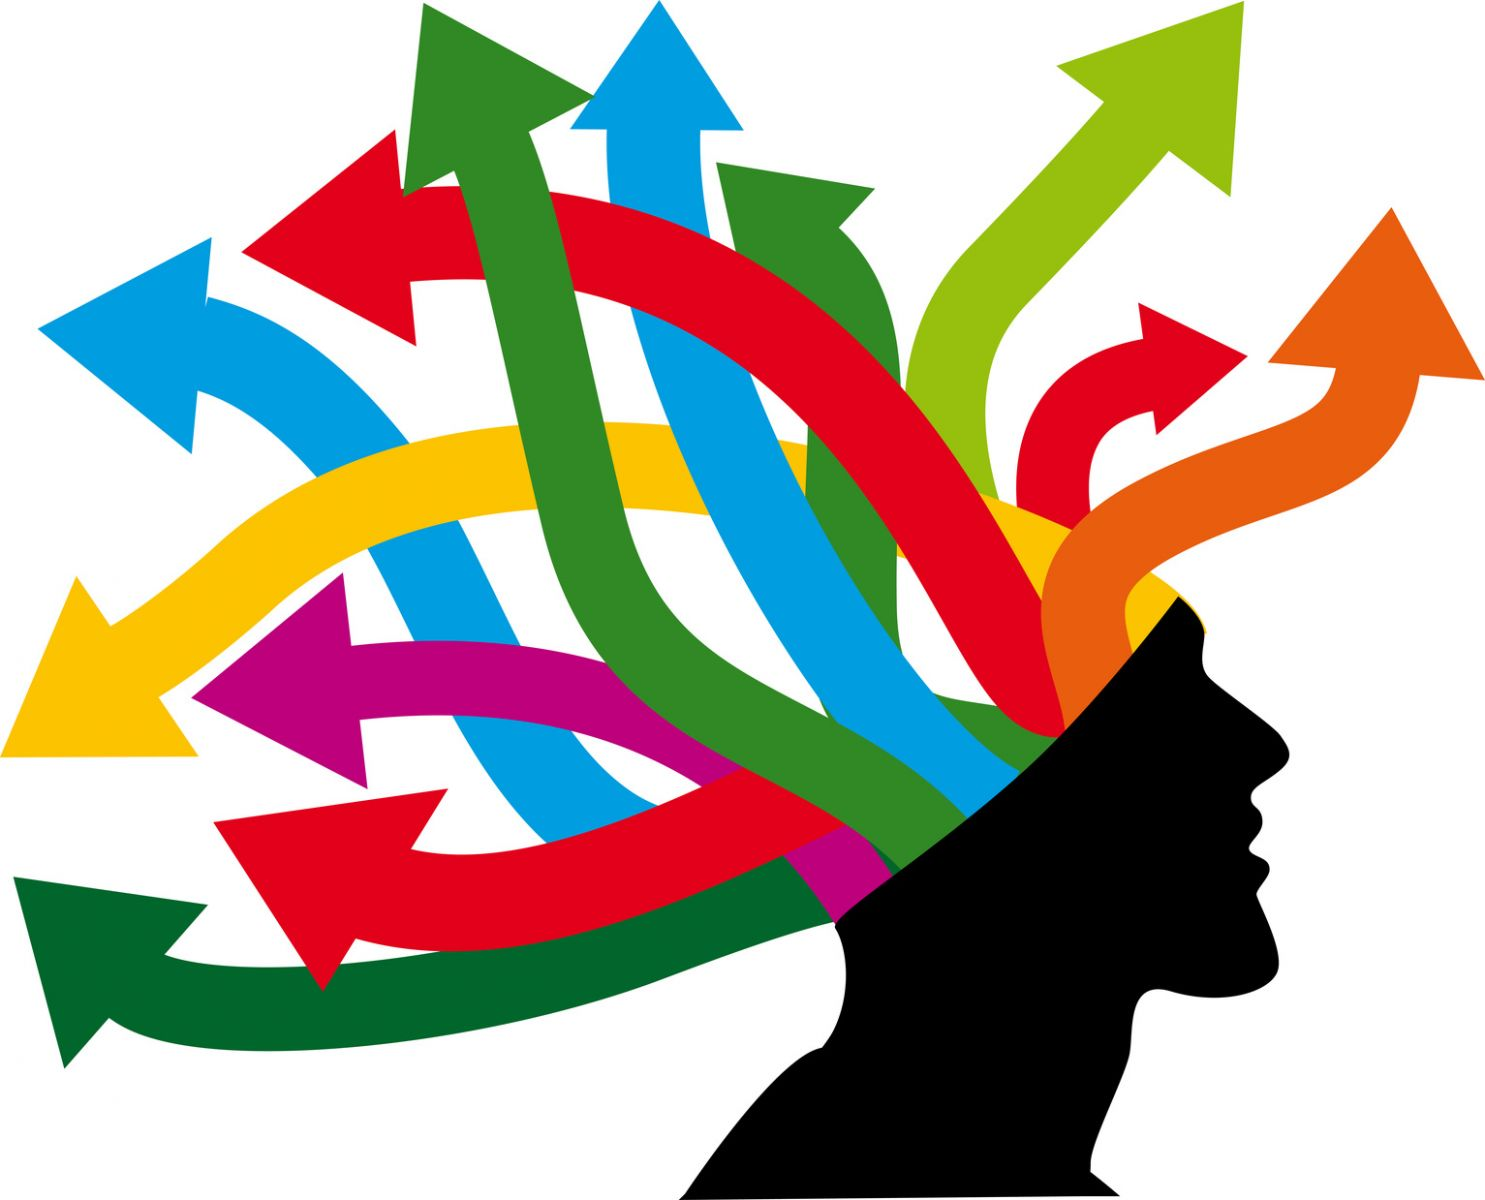 https://learningcenter.unc.edu/files/2015/09/ADHD-brain.jpg